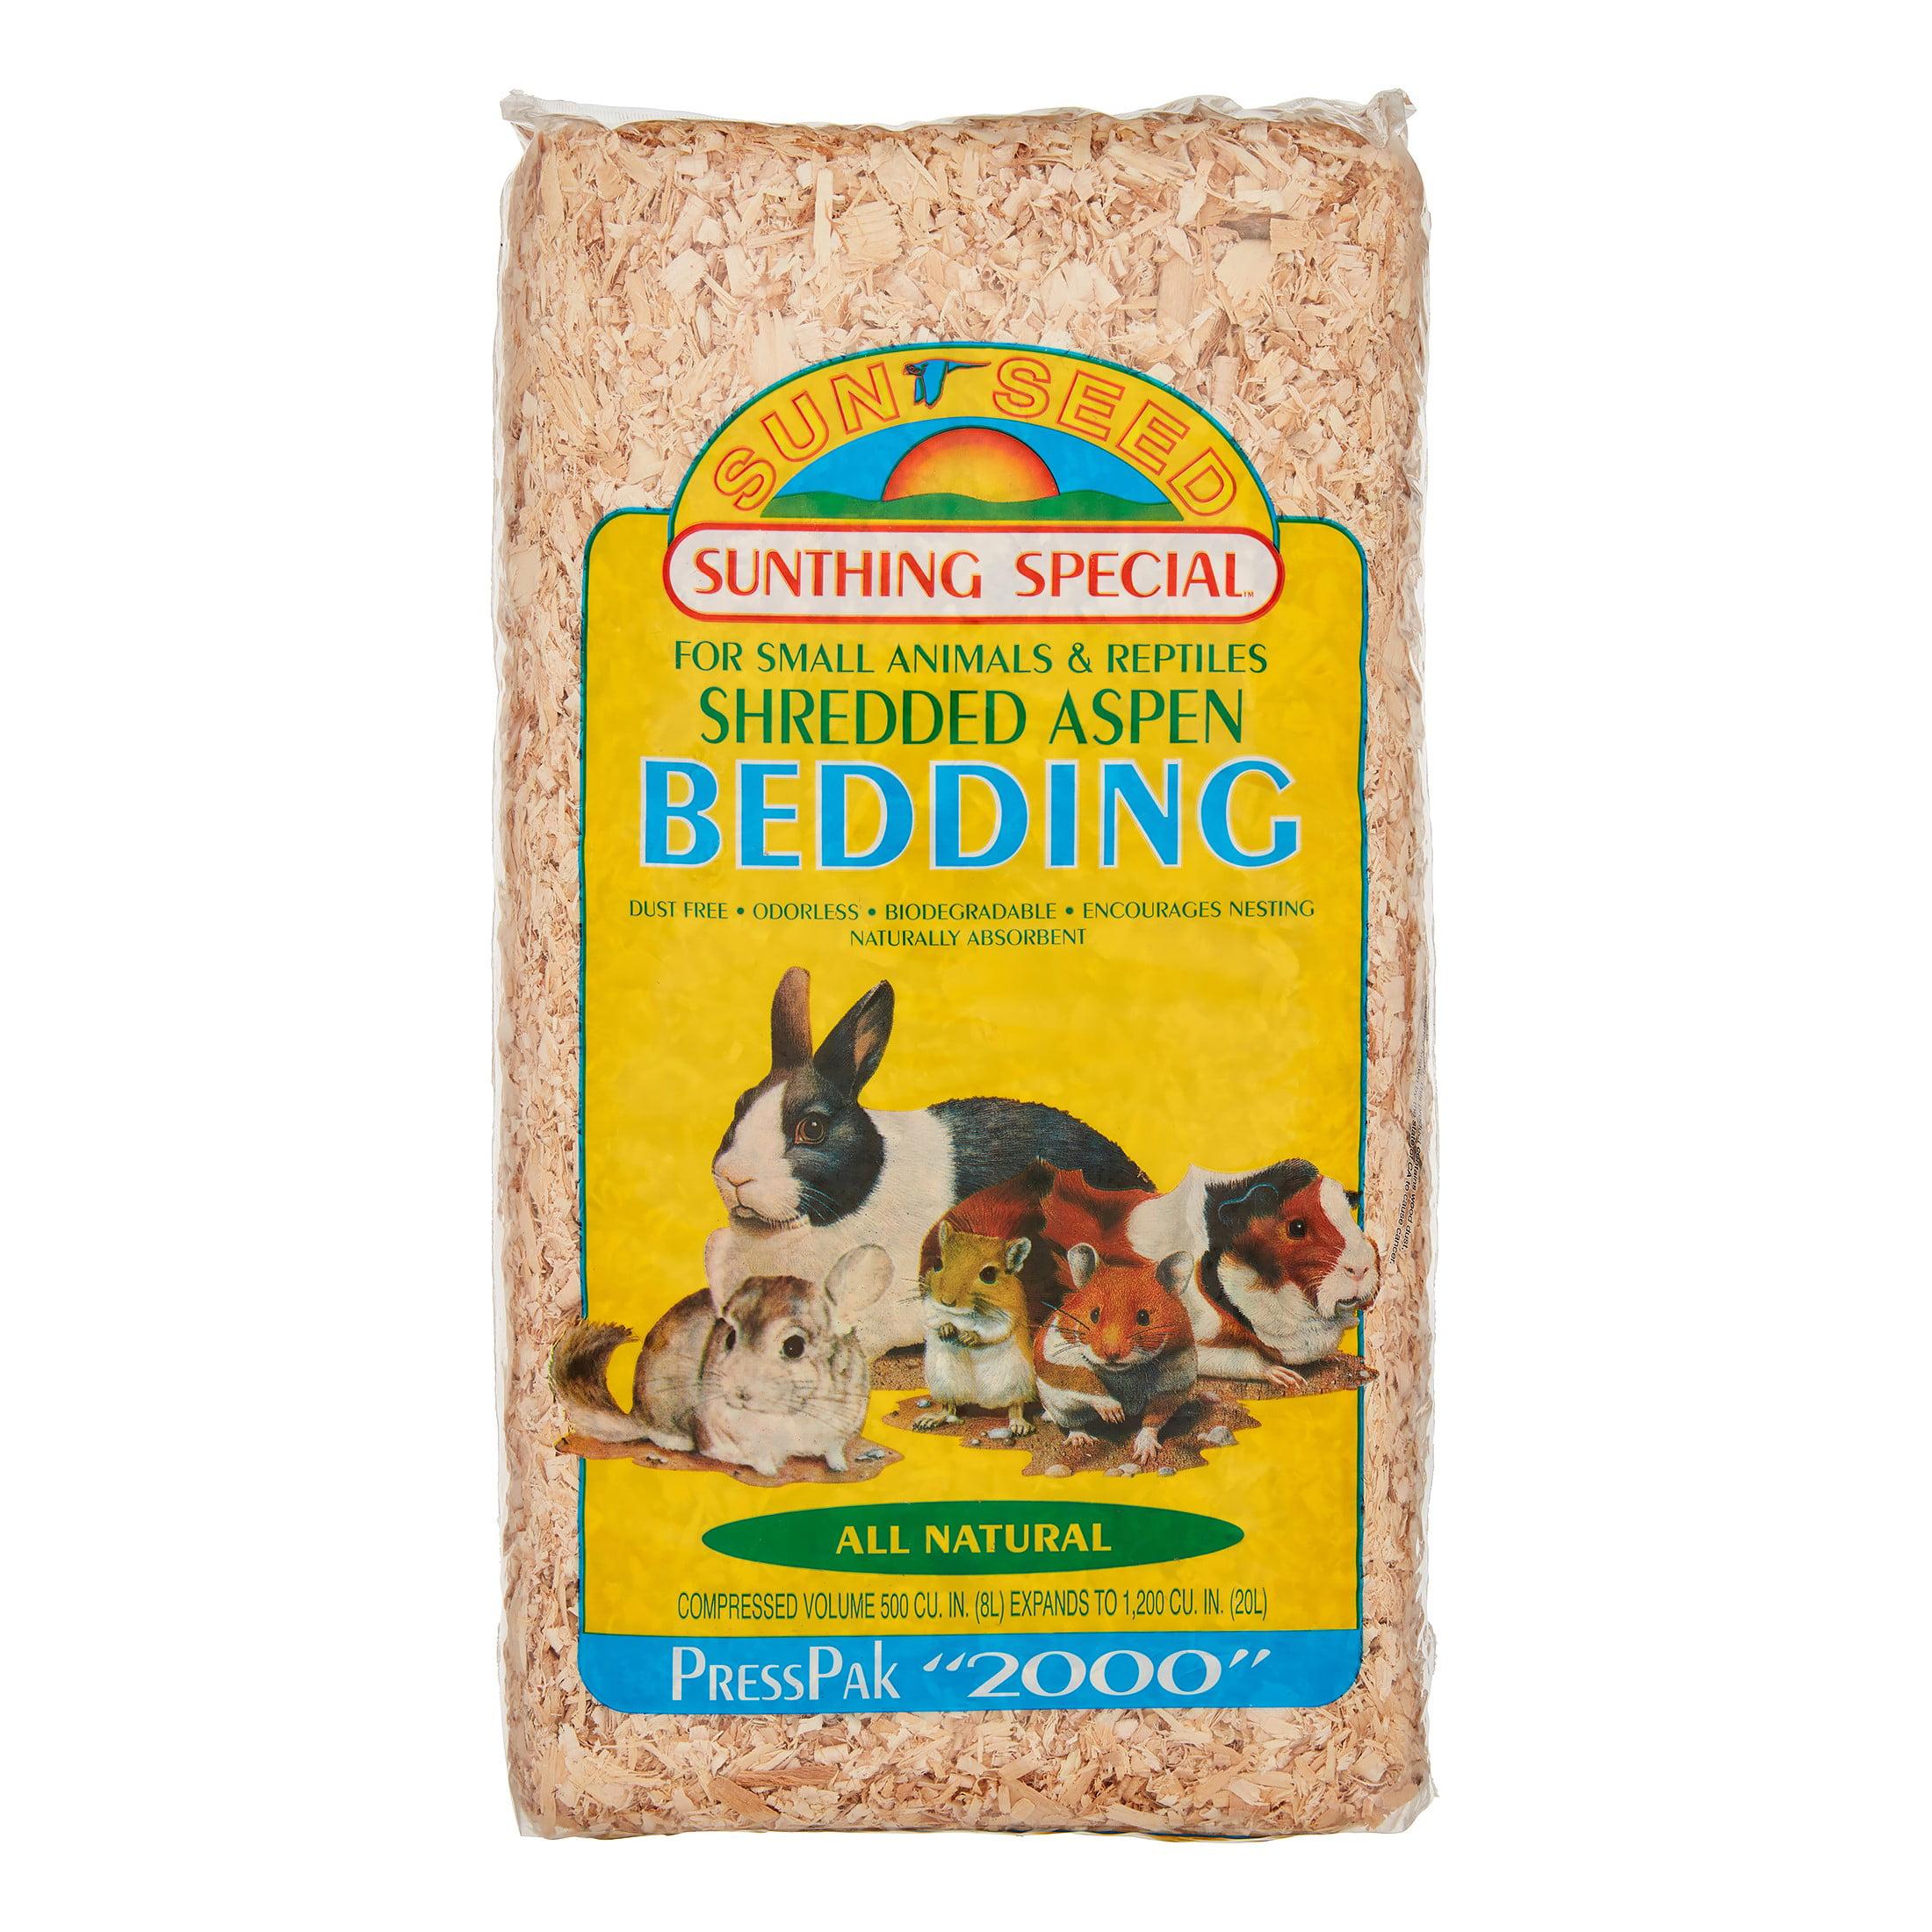 Sunseed Aspen PressPak Small Animal Bedding, 20 Cu In